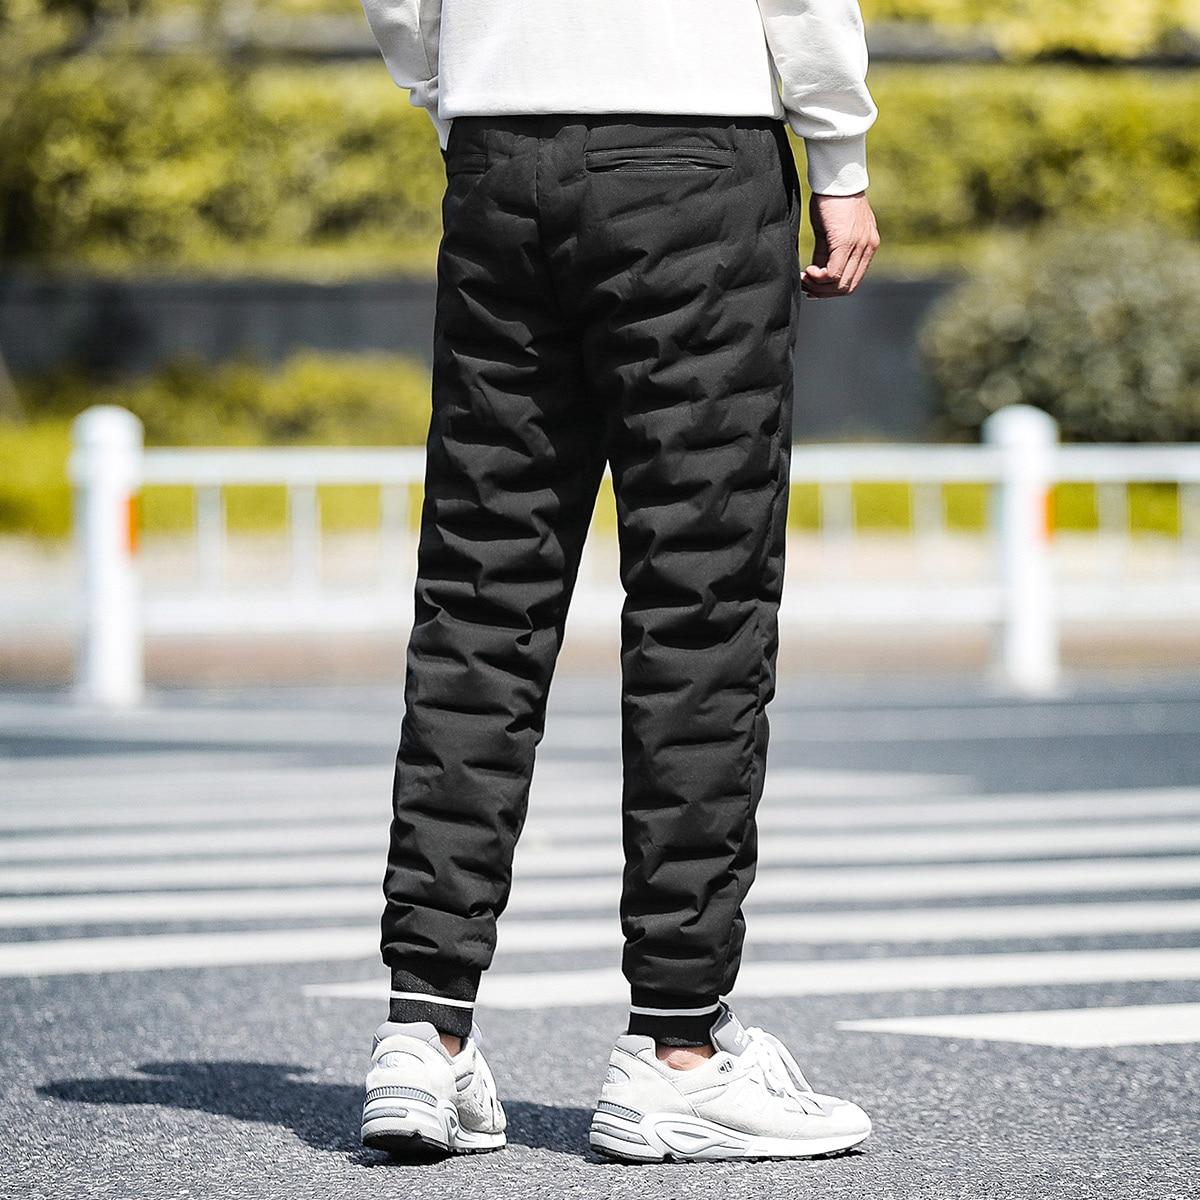 Silm Nylon Track Pants Men's Slim Patchwork Pants Thickened  Pants Men Pants Work Pants Men Corduroy Winter Mens Pants NN50CK